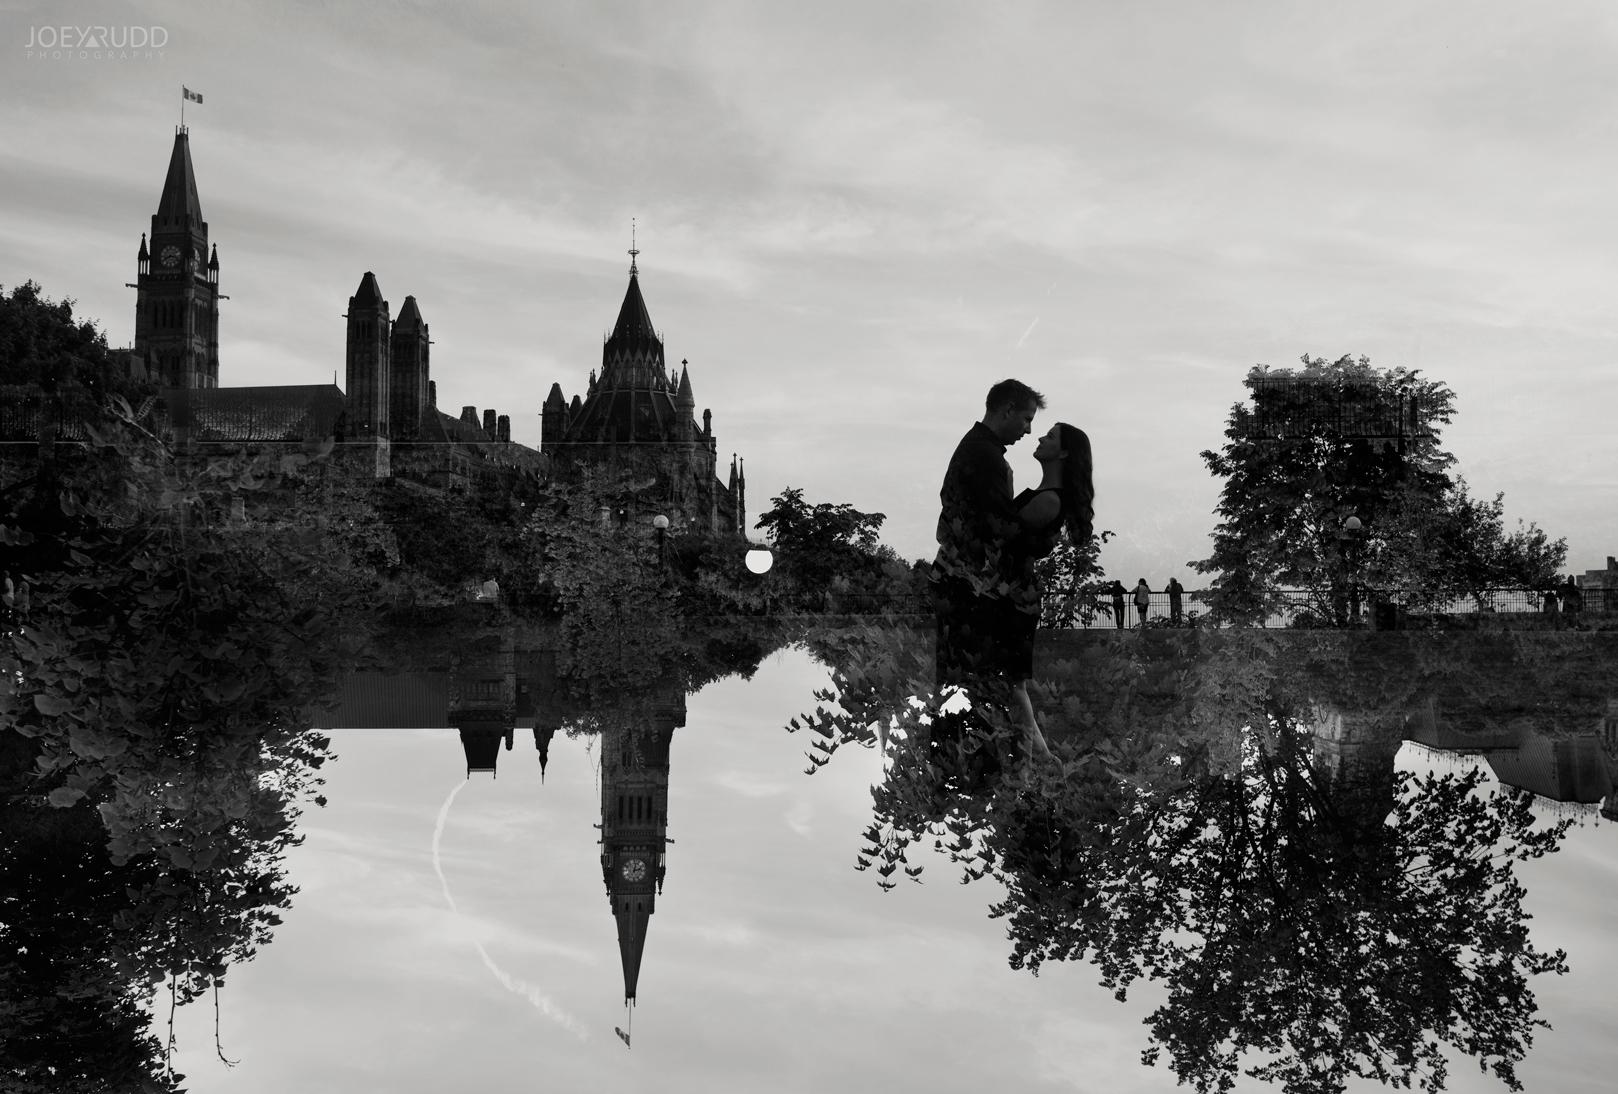 Engagement Photos, Ottawa Photographer, Ottawa Wedding, Ottawa Wedding photographer, downtown ottawa, chateau laurier, light leaks, fun, happy, enaged, photographer, joey rudd photography, lightsabers, star wars, unique, water, double exposure